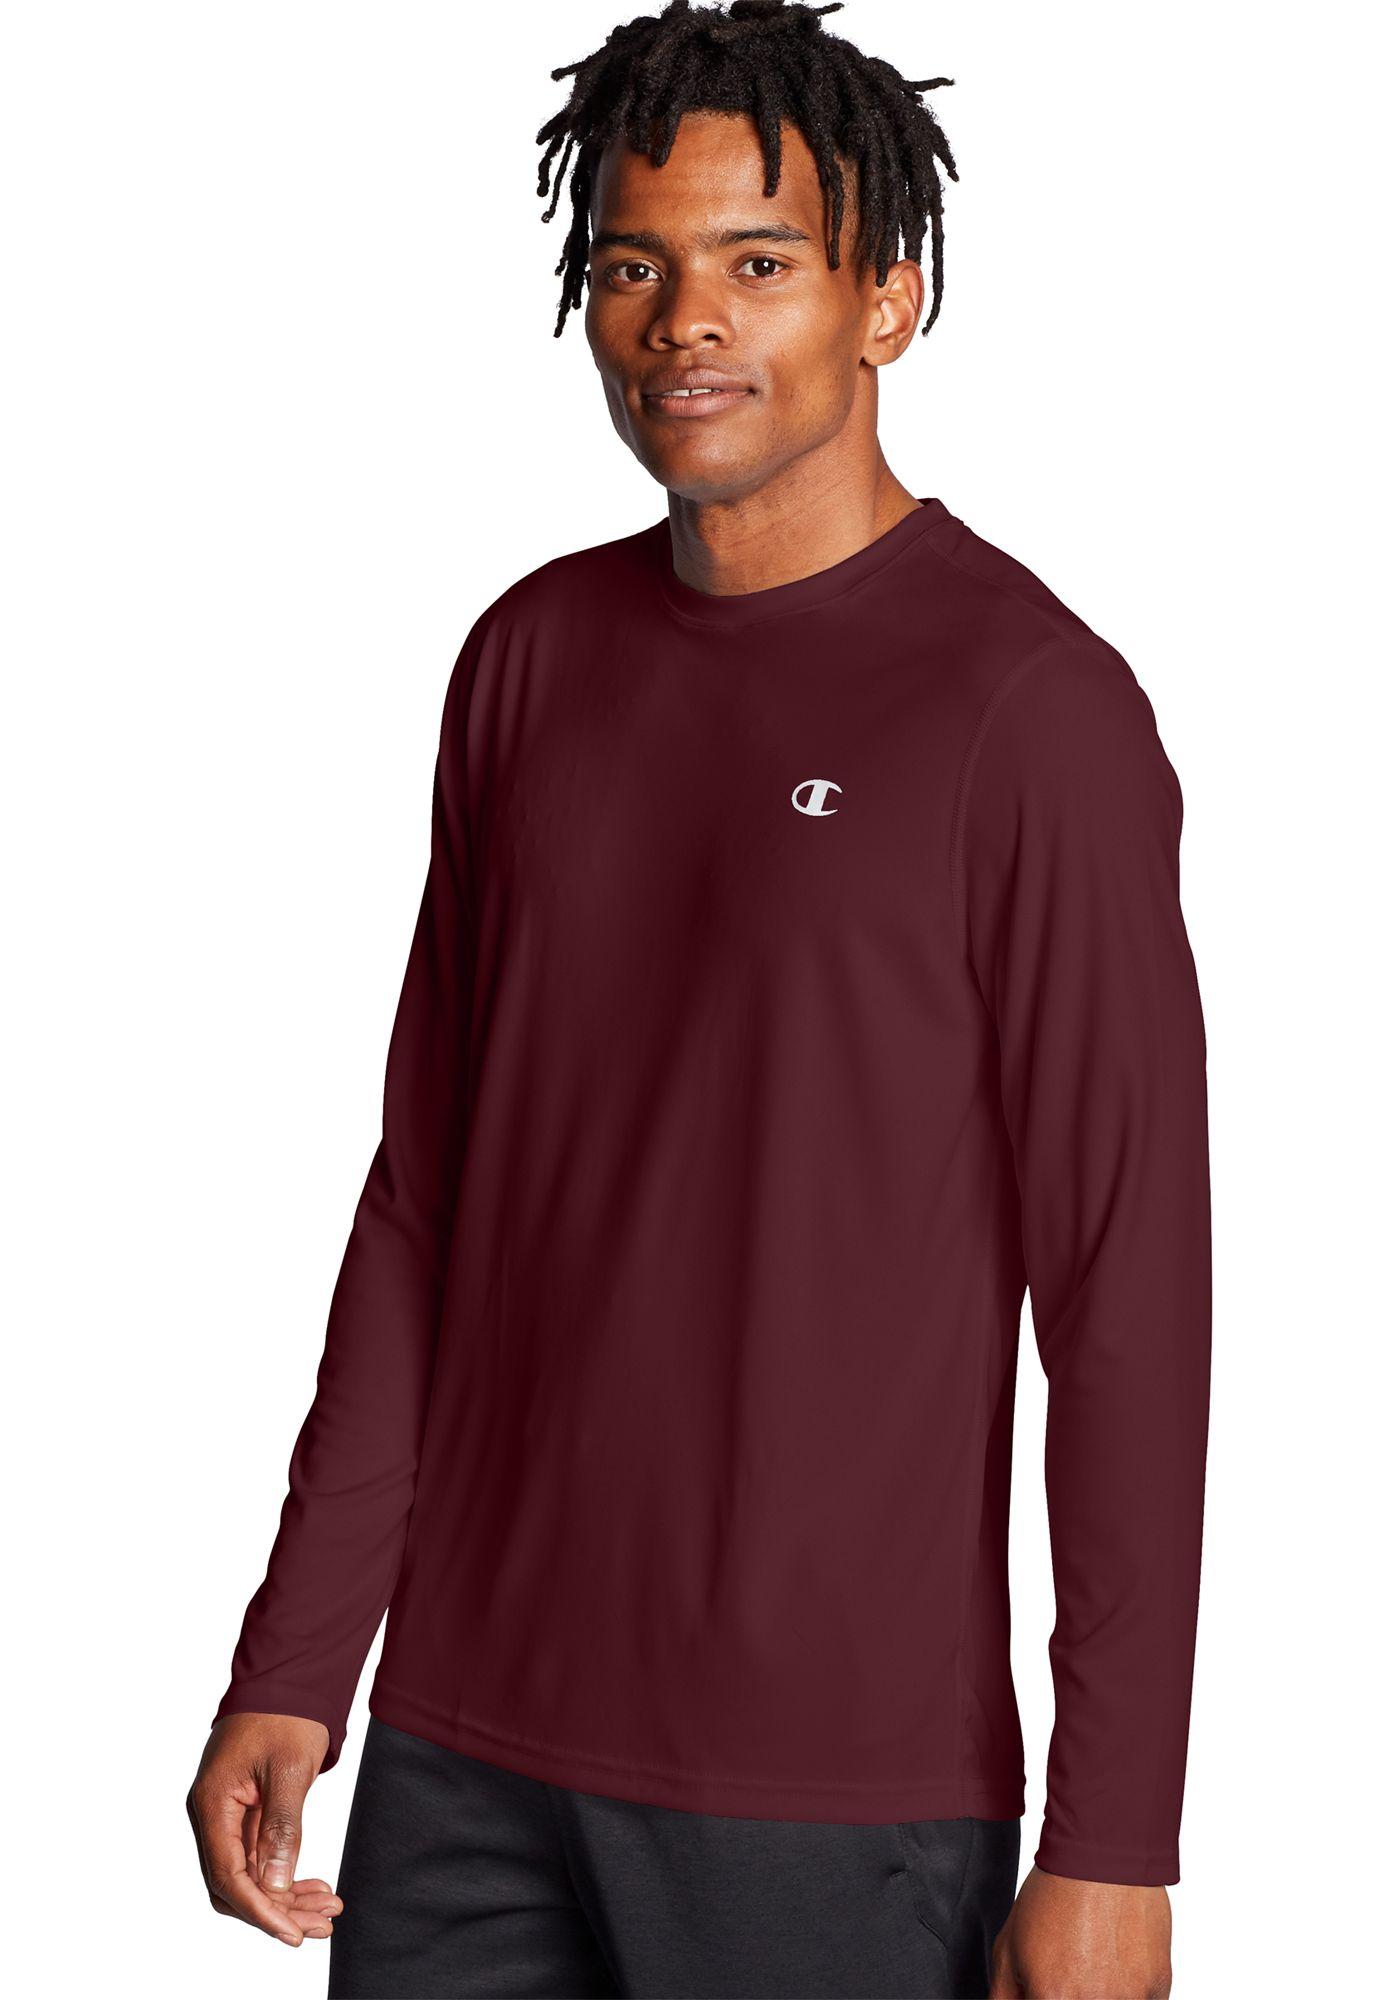 Champion Men's Double Dry Long Sleeve Shirt